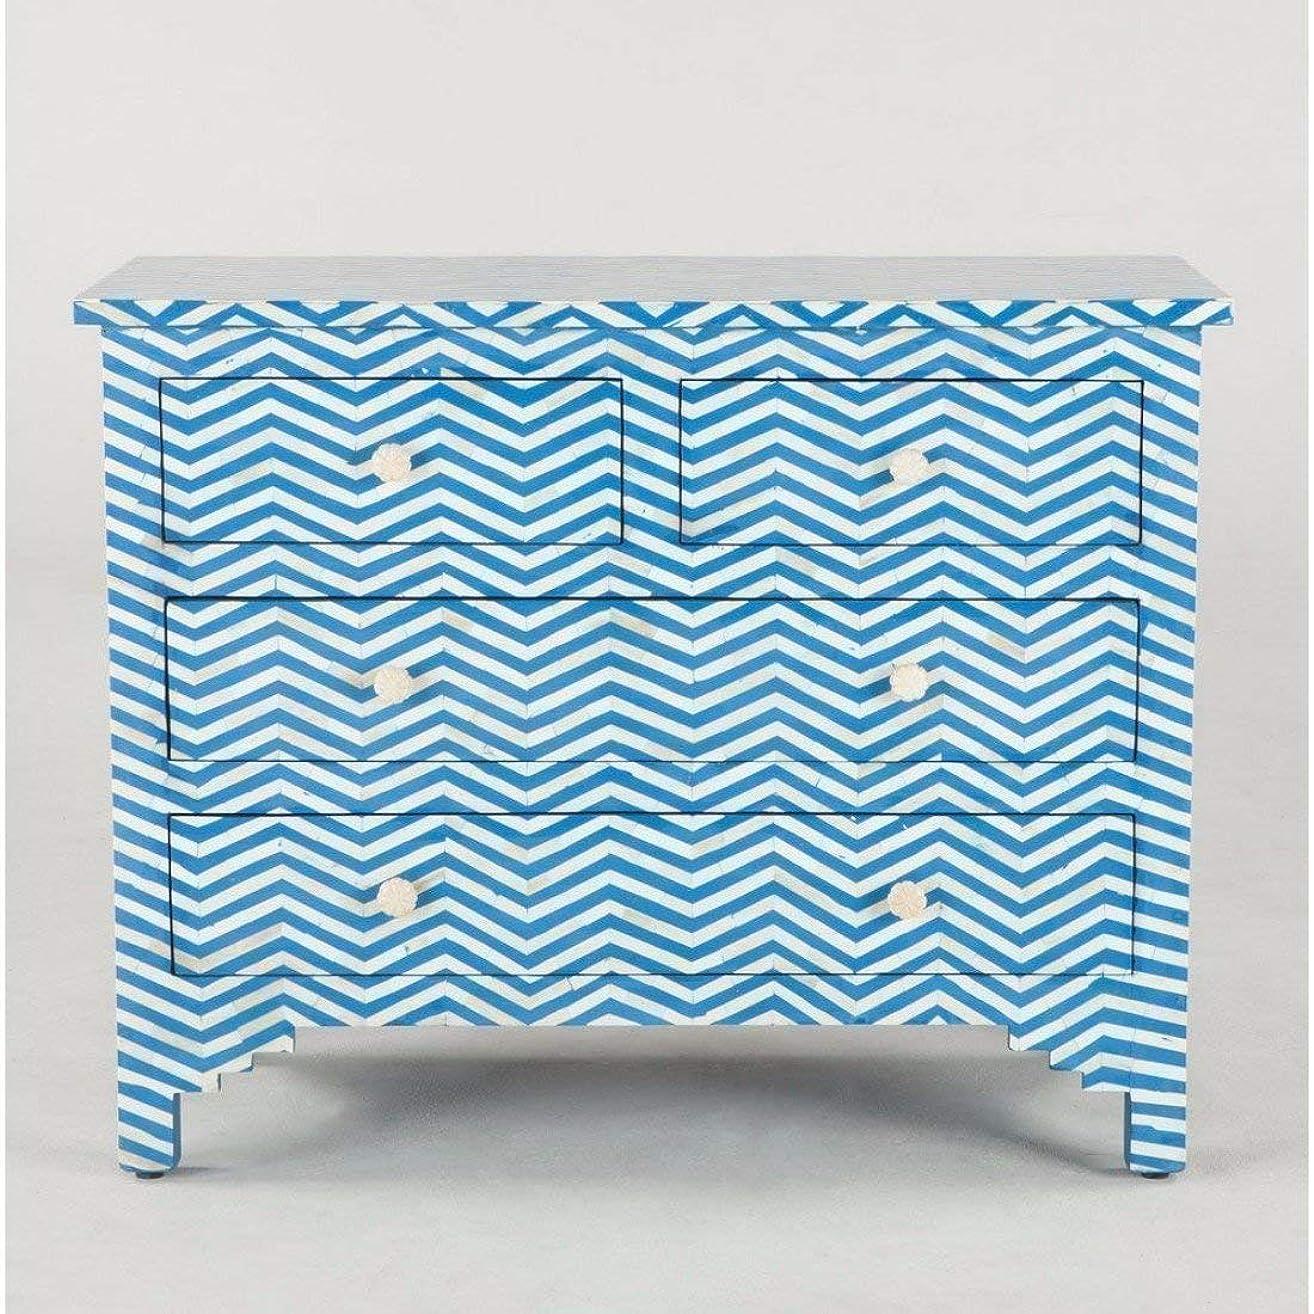 Macrame Art Modern Design Bone & Horn Inlay Epoxy Resin Rectangular Blue & White Drawer Set, Includes 4 Drawers With Wooden Holder, Rustic Finish